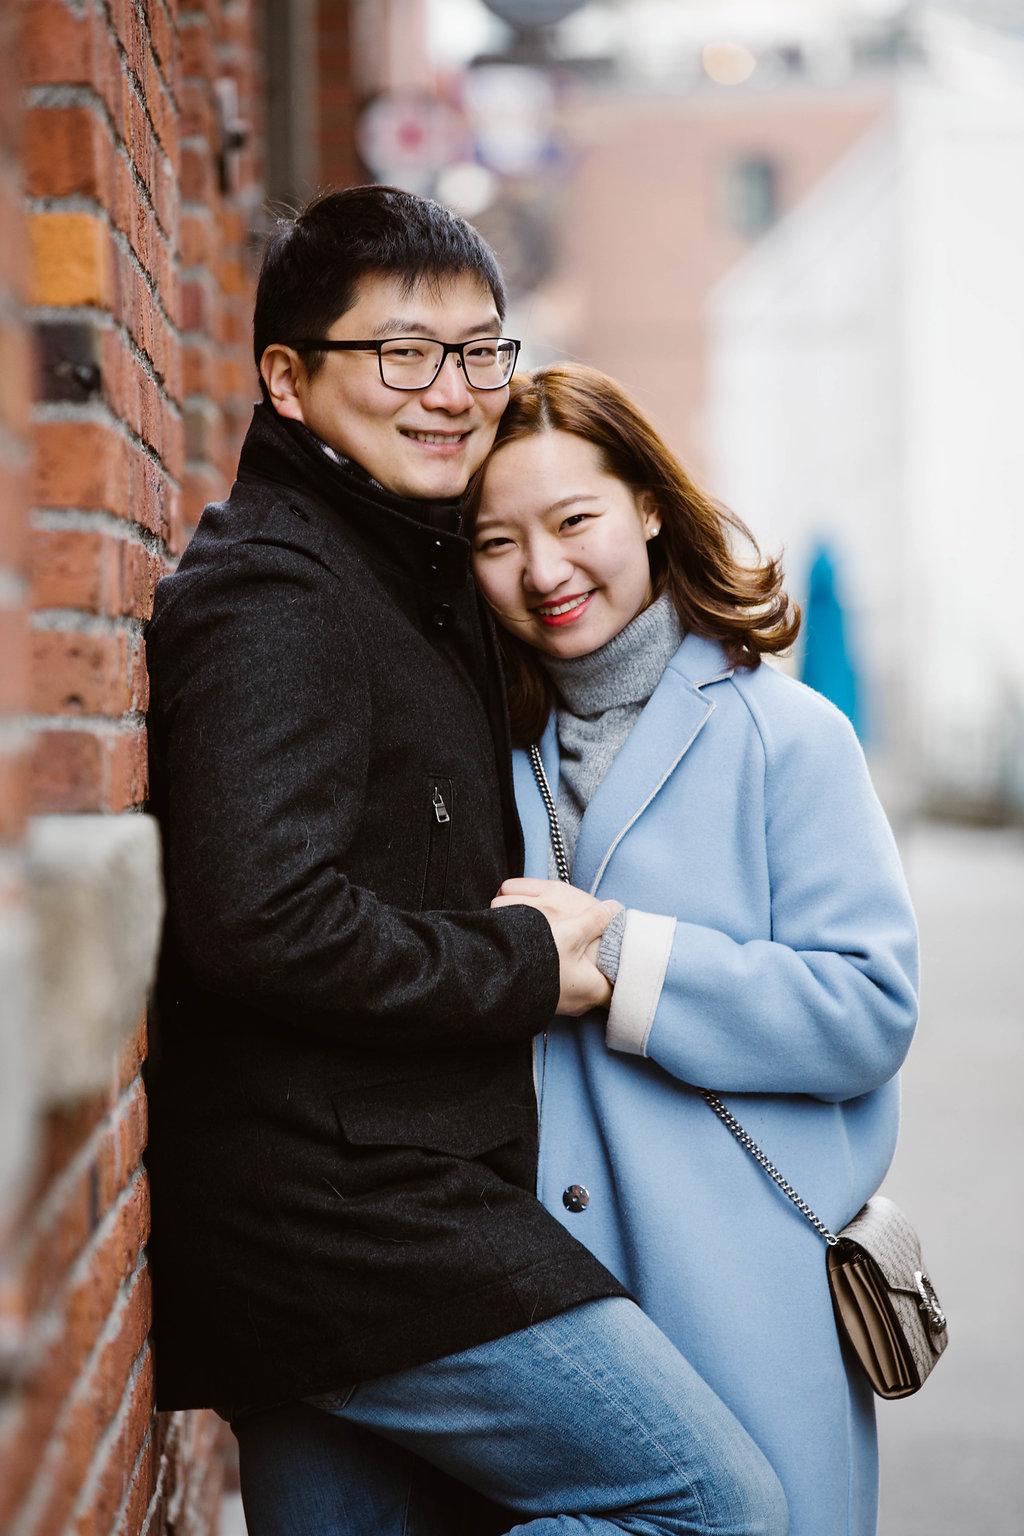 Qian+Jacson_best+Seattle+wedding+Photographer_APW3.JPG